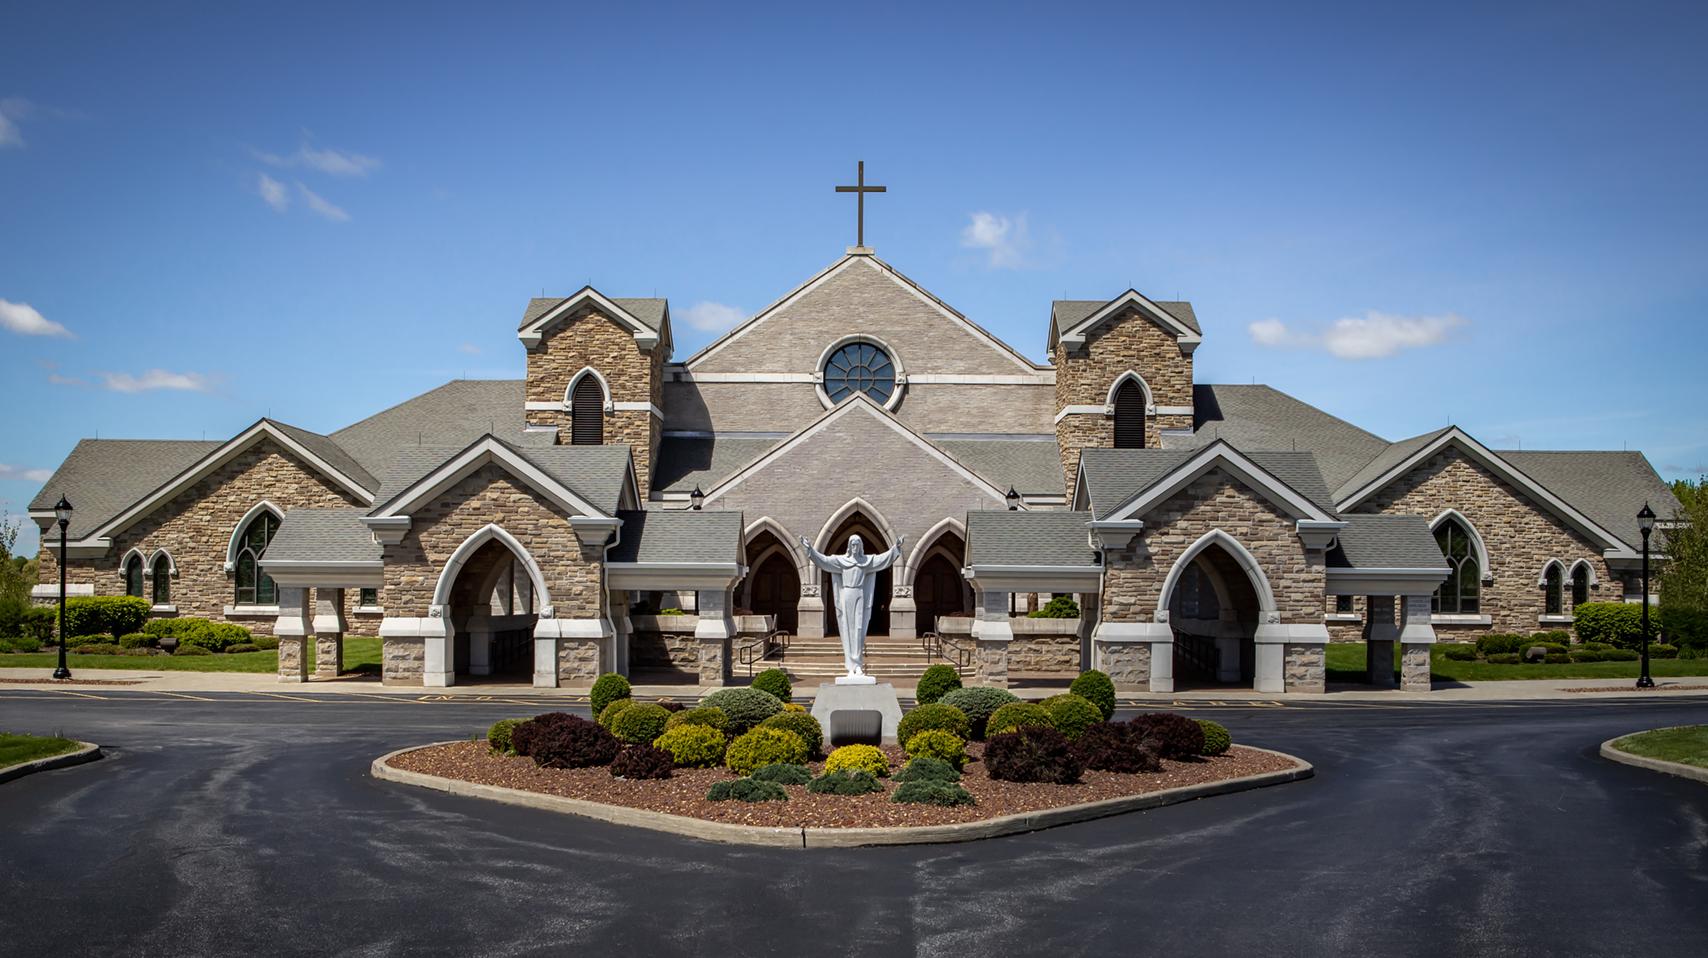 Saint Kateri Tekakwitha Roman Catholic Church - Dutchess County NY